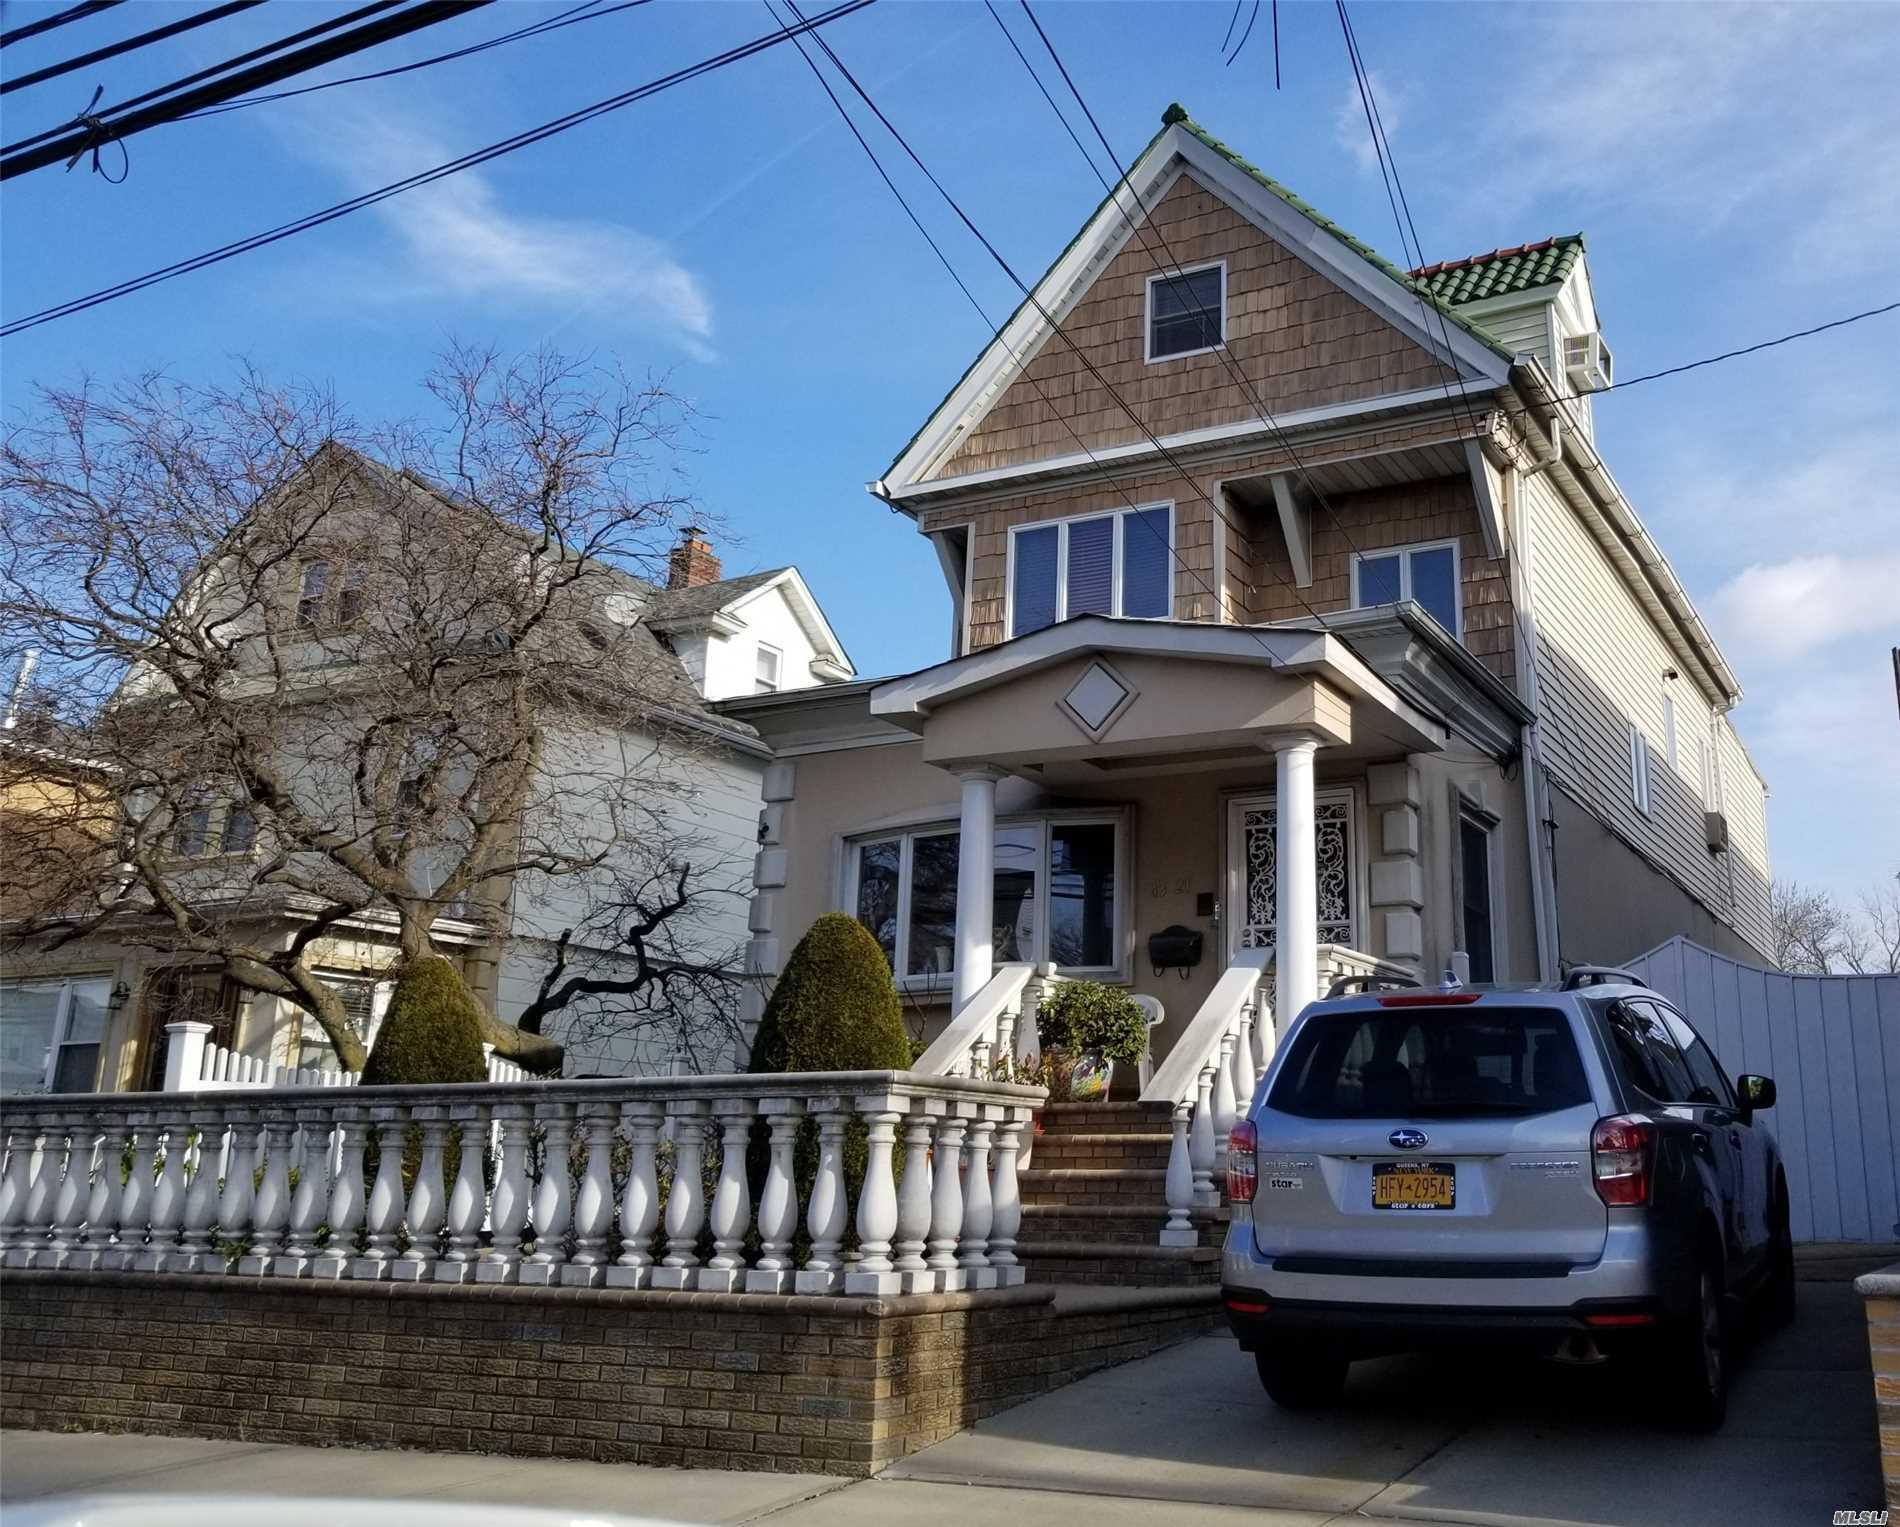 Property for sale at 43-21 163 Street, Flushing NY 11358, Flushing,  New York 11358